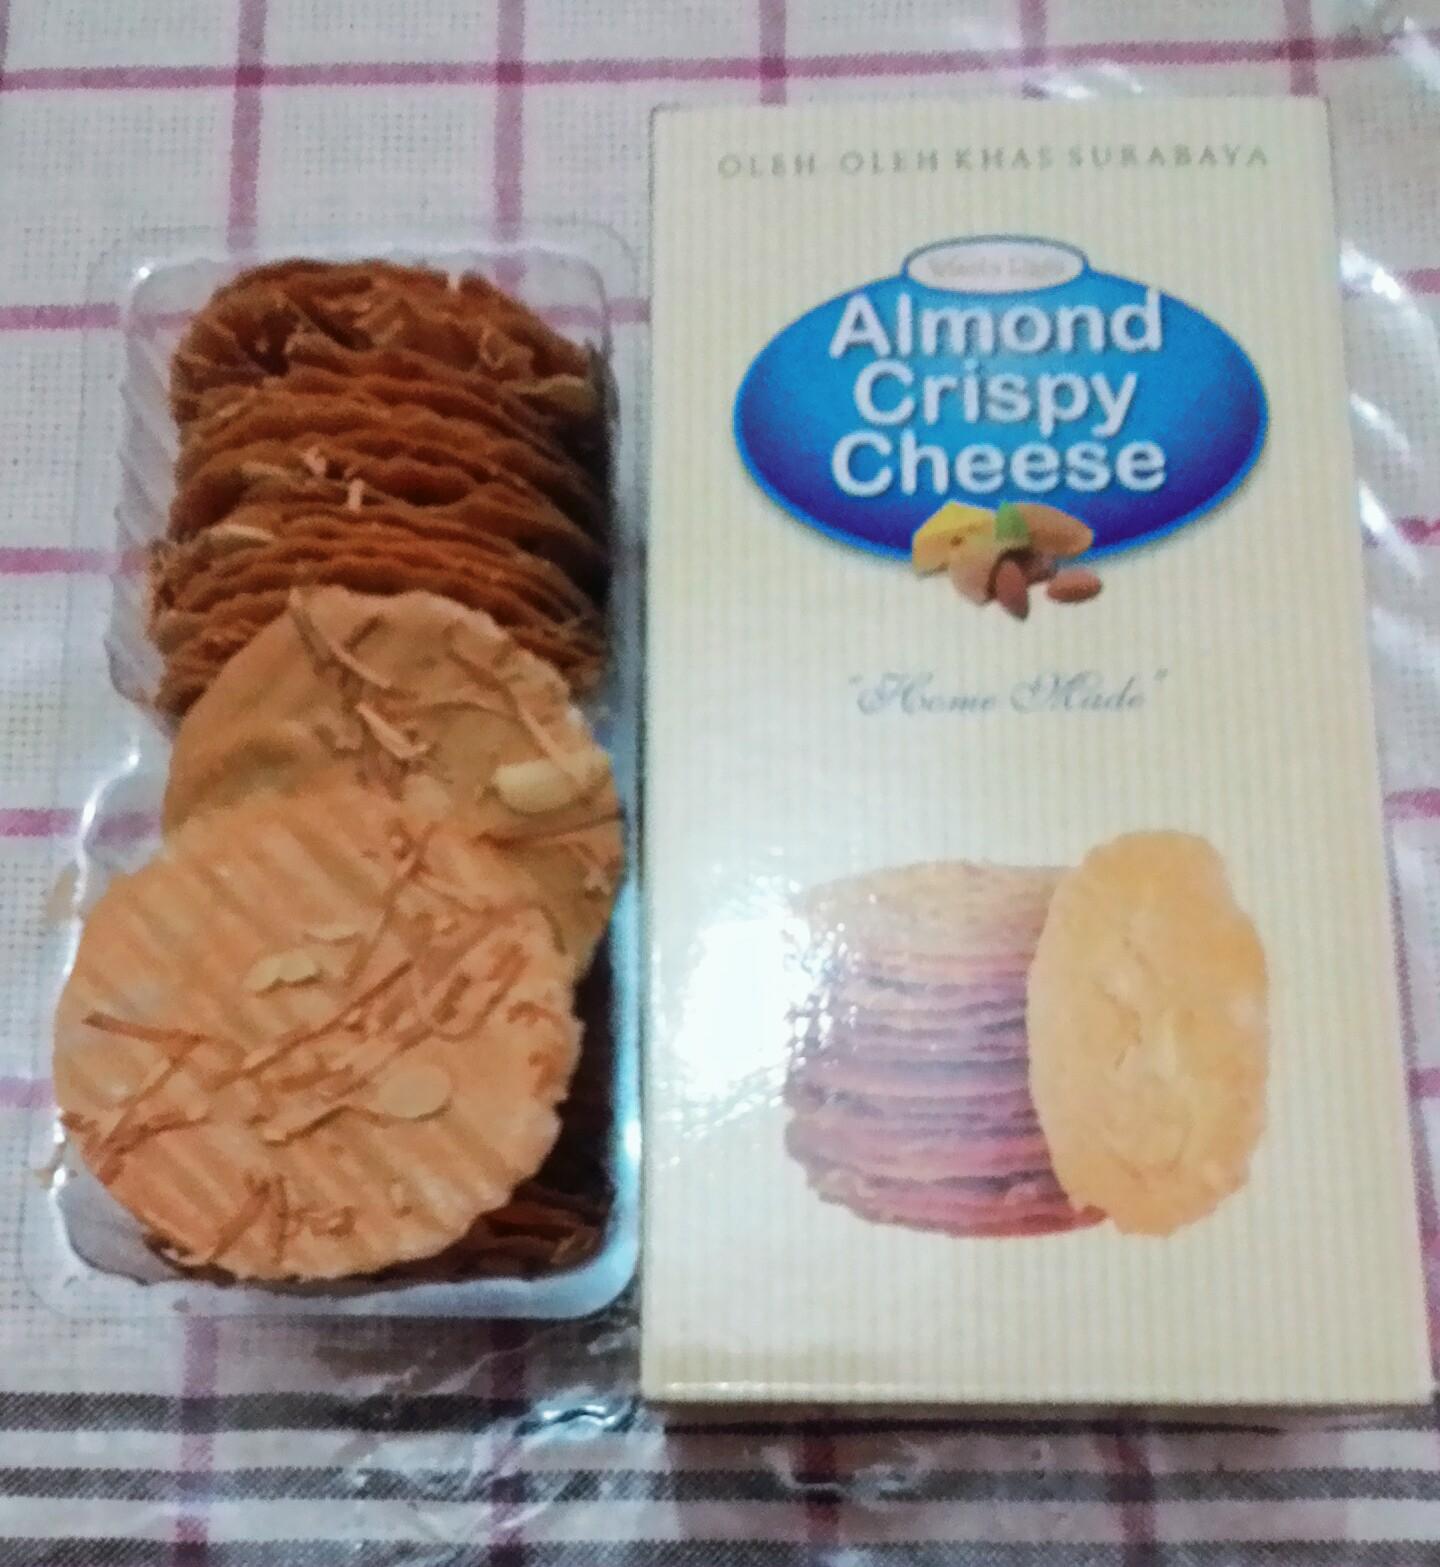 Ugik Madyo Lifestyle Blogger Almond Crispy Cheese Wisata